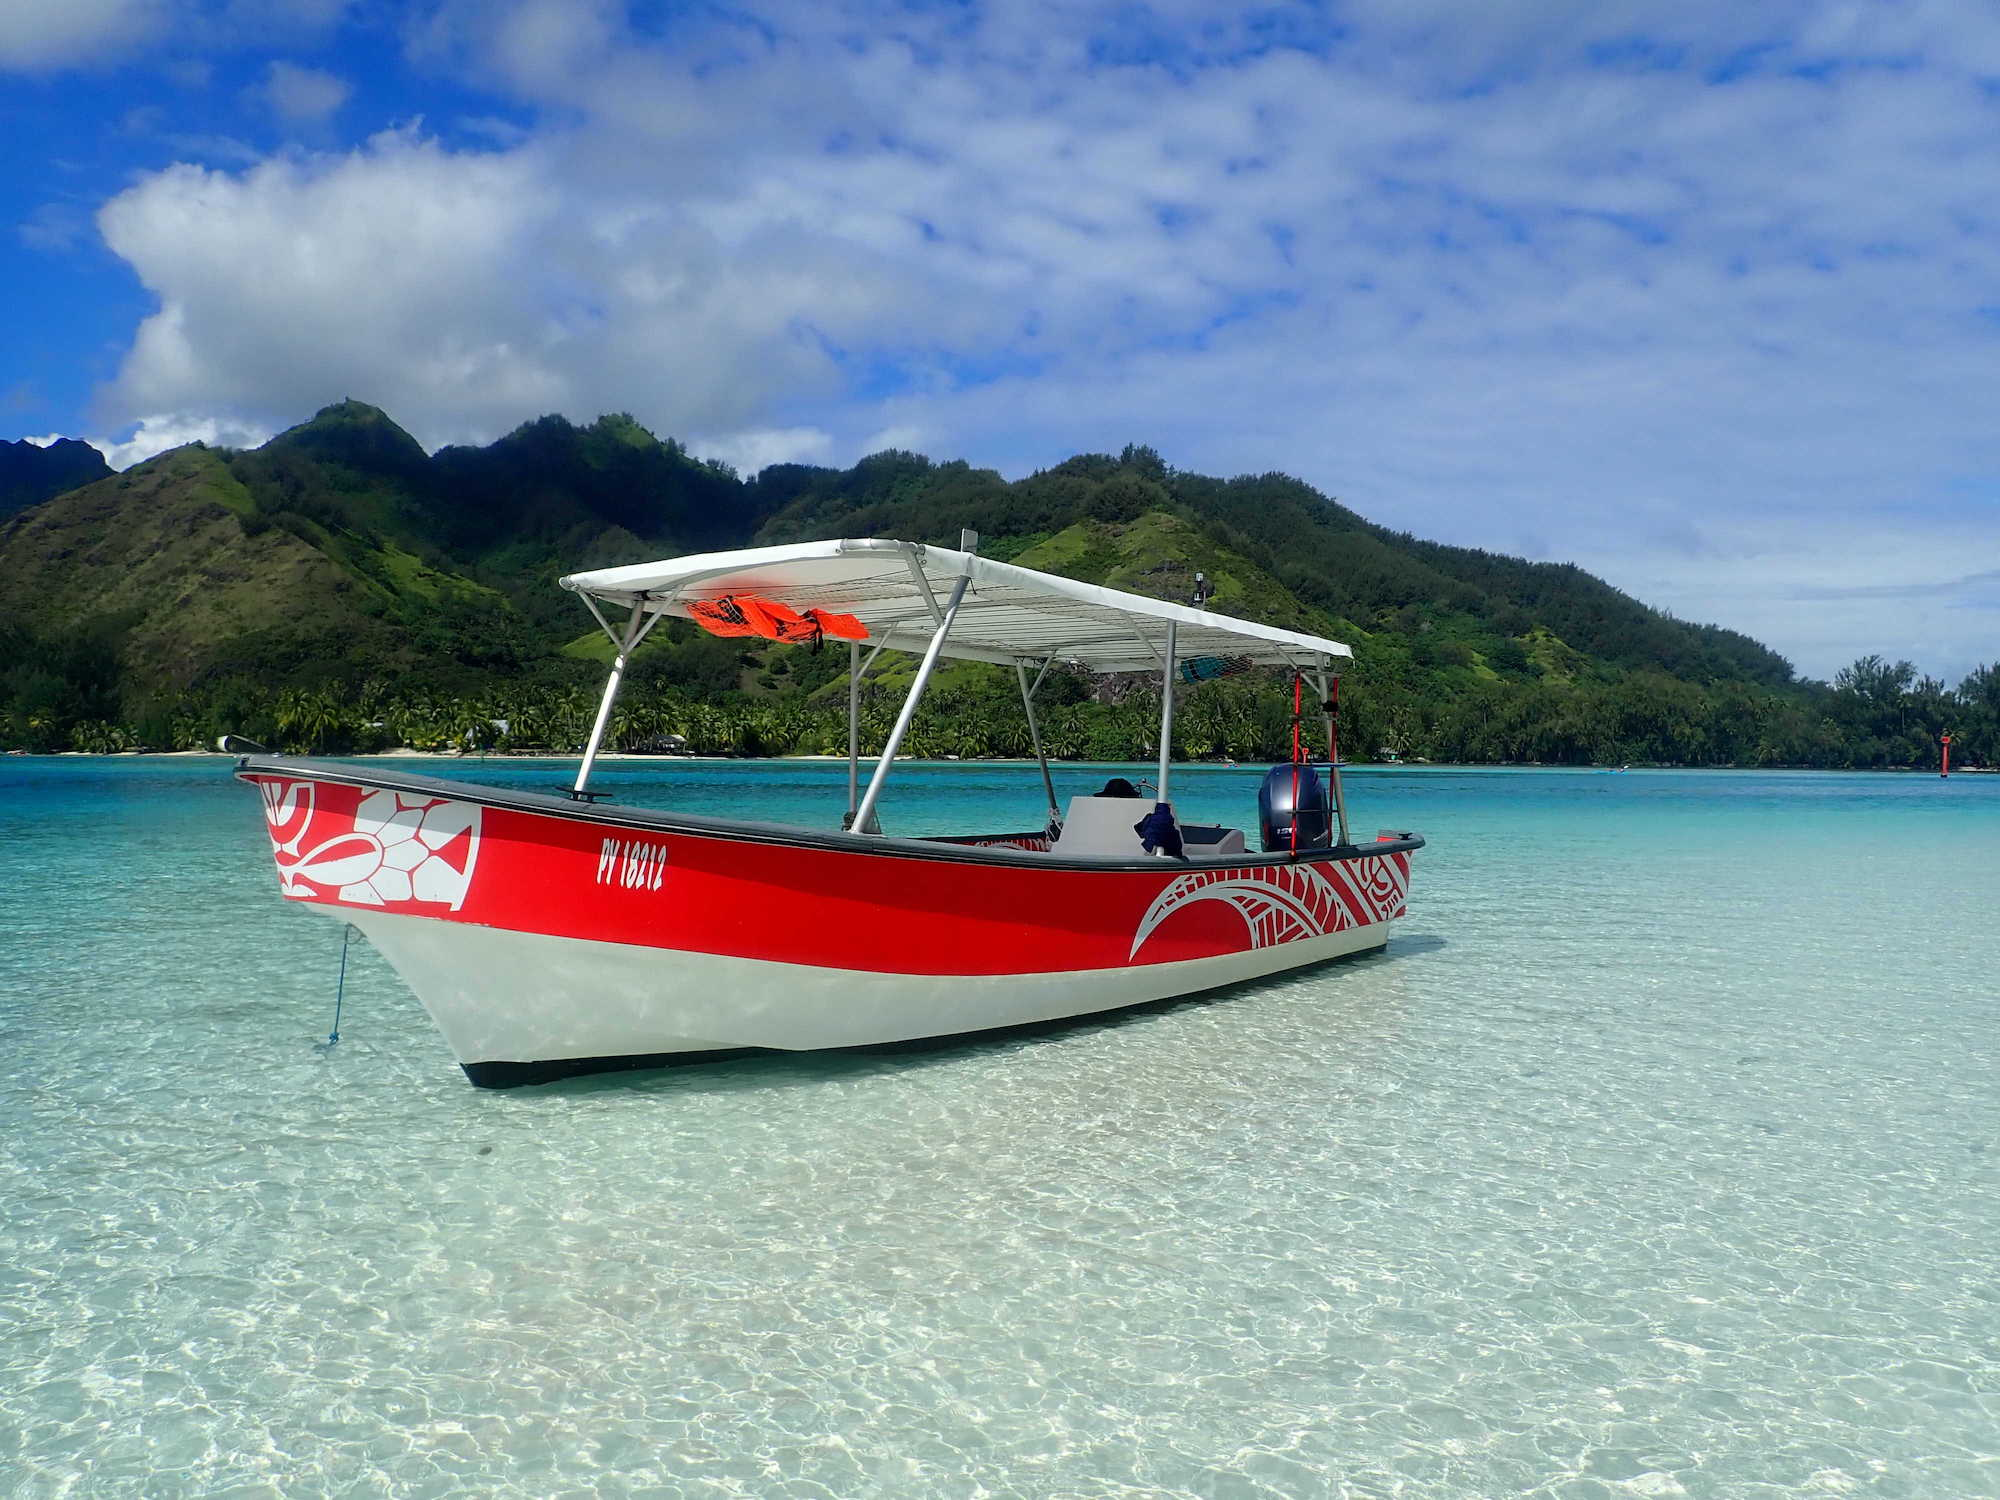 https://tahititourisme.nz/wp-content/uploads/2020/09/Boat-Hinaloa.jpg